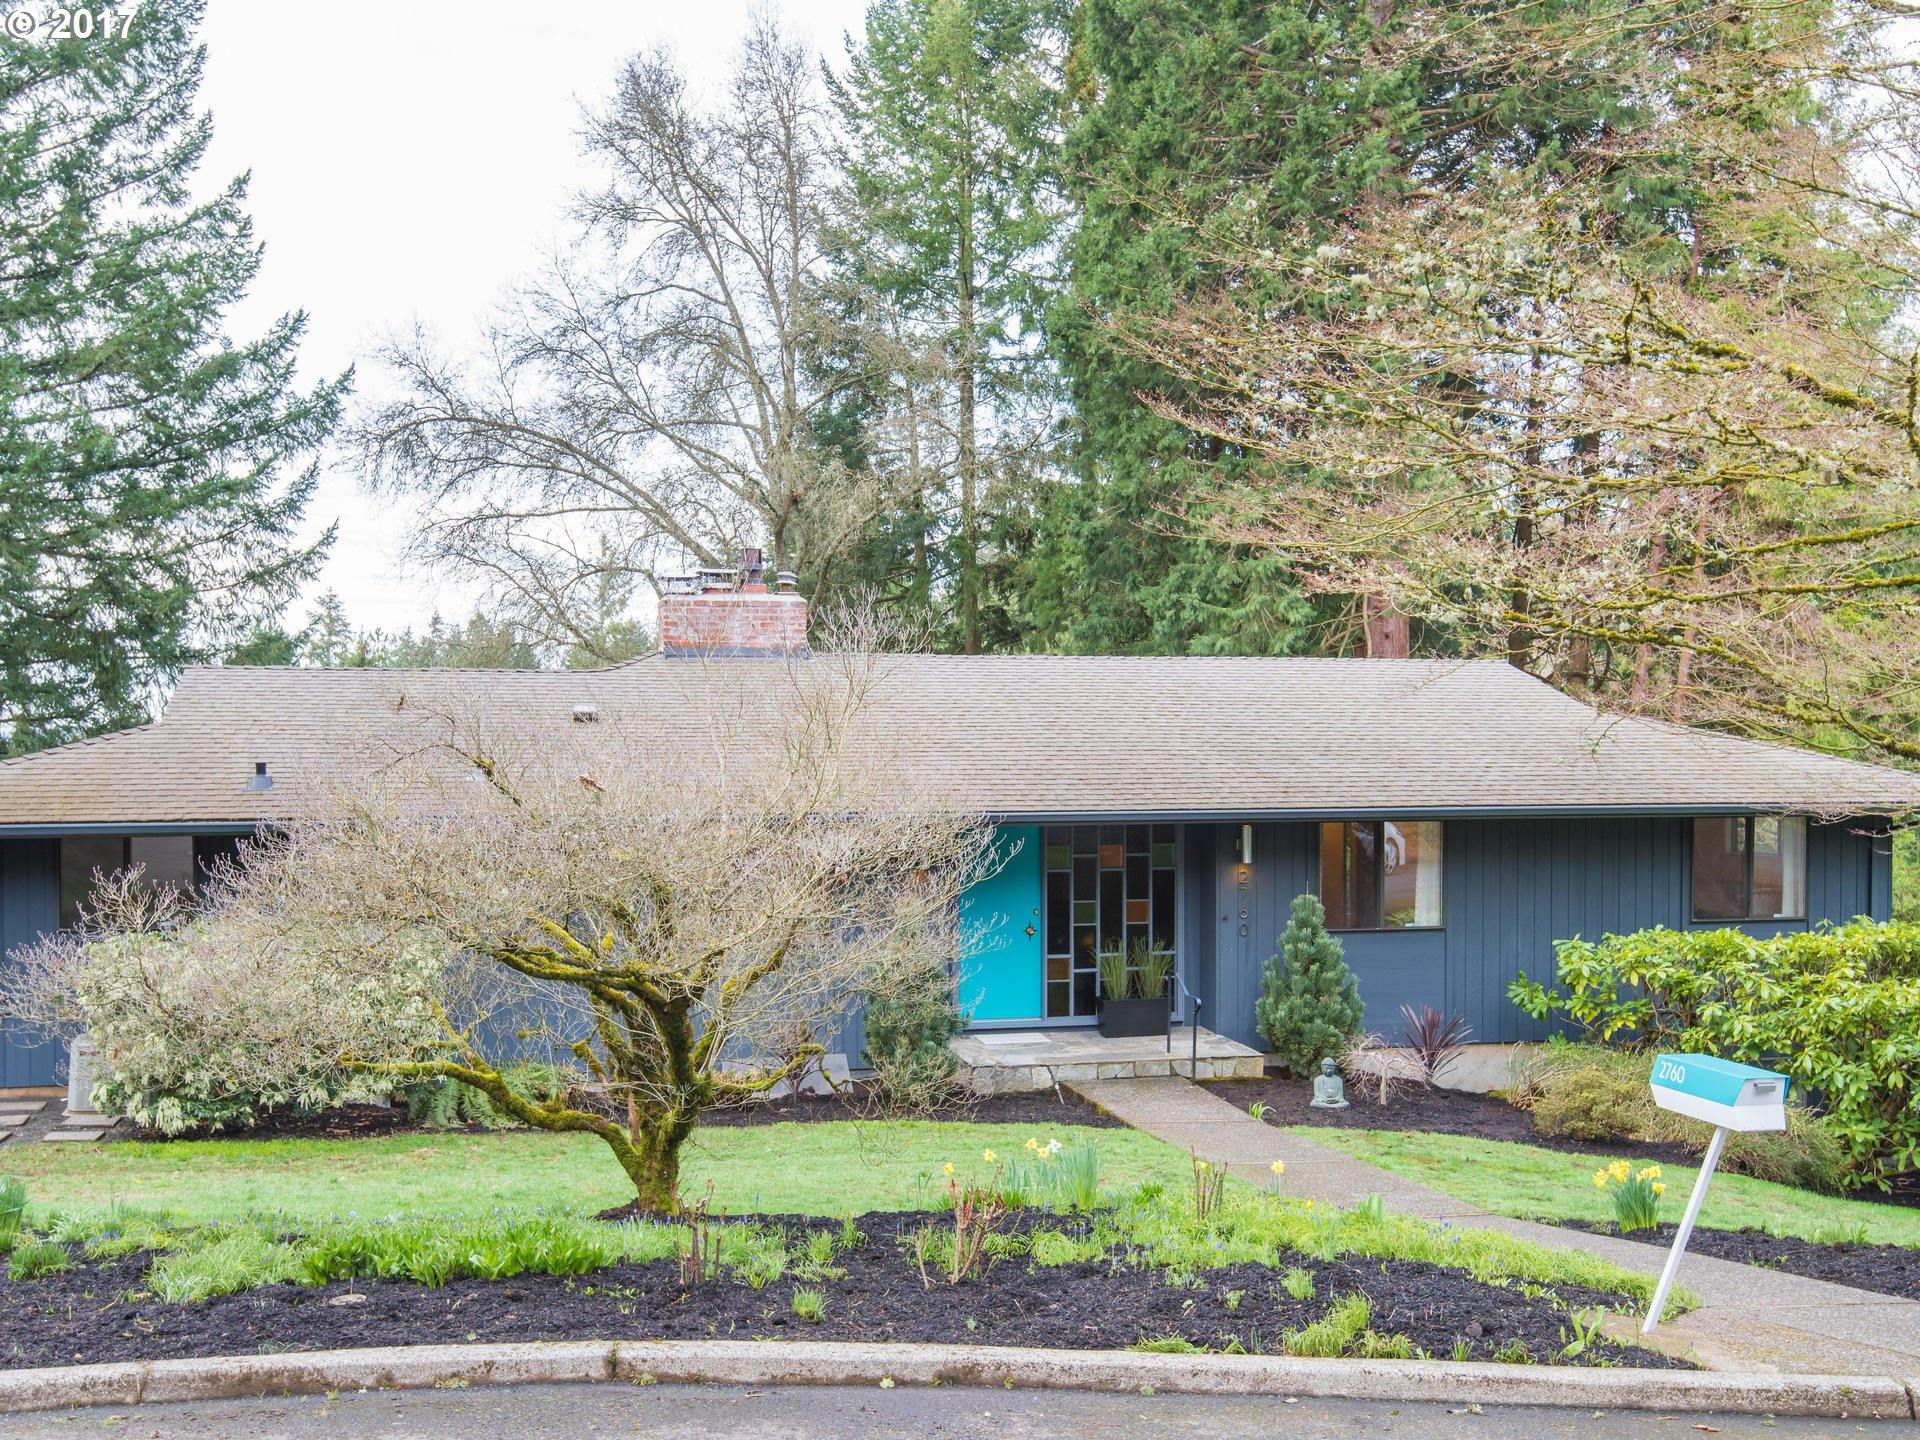 Portland midcentury home with subtle retro touches asks $800K